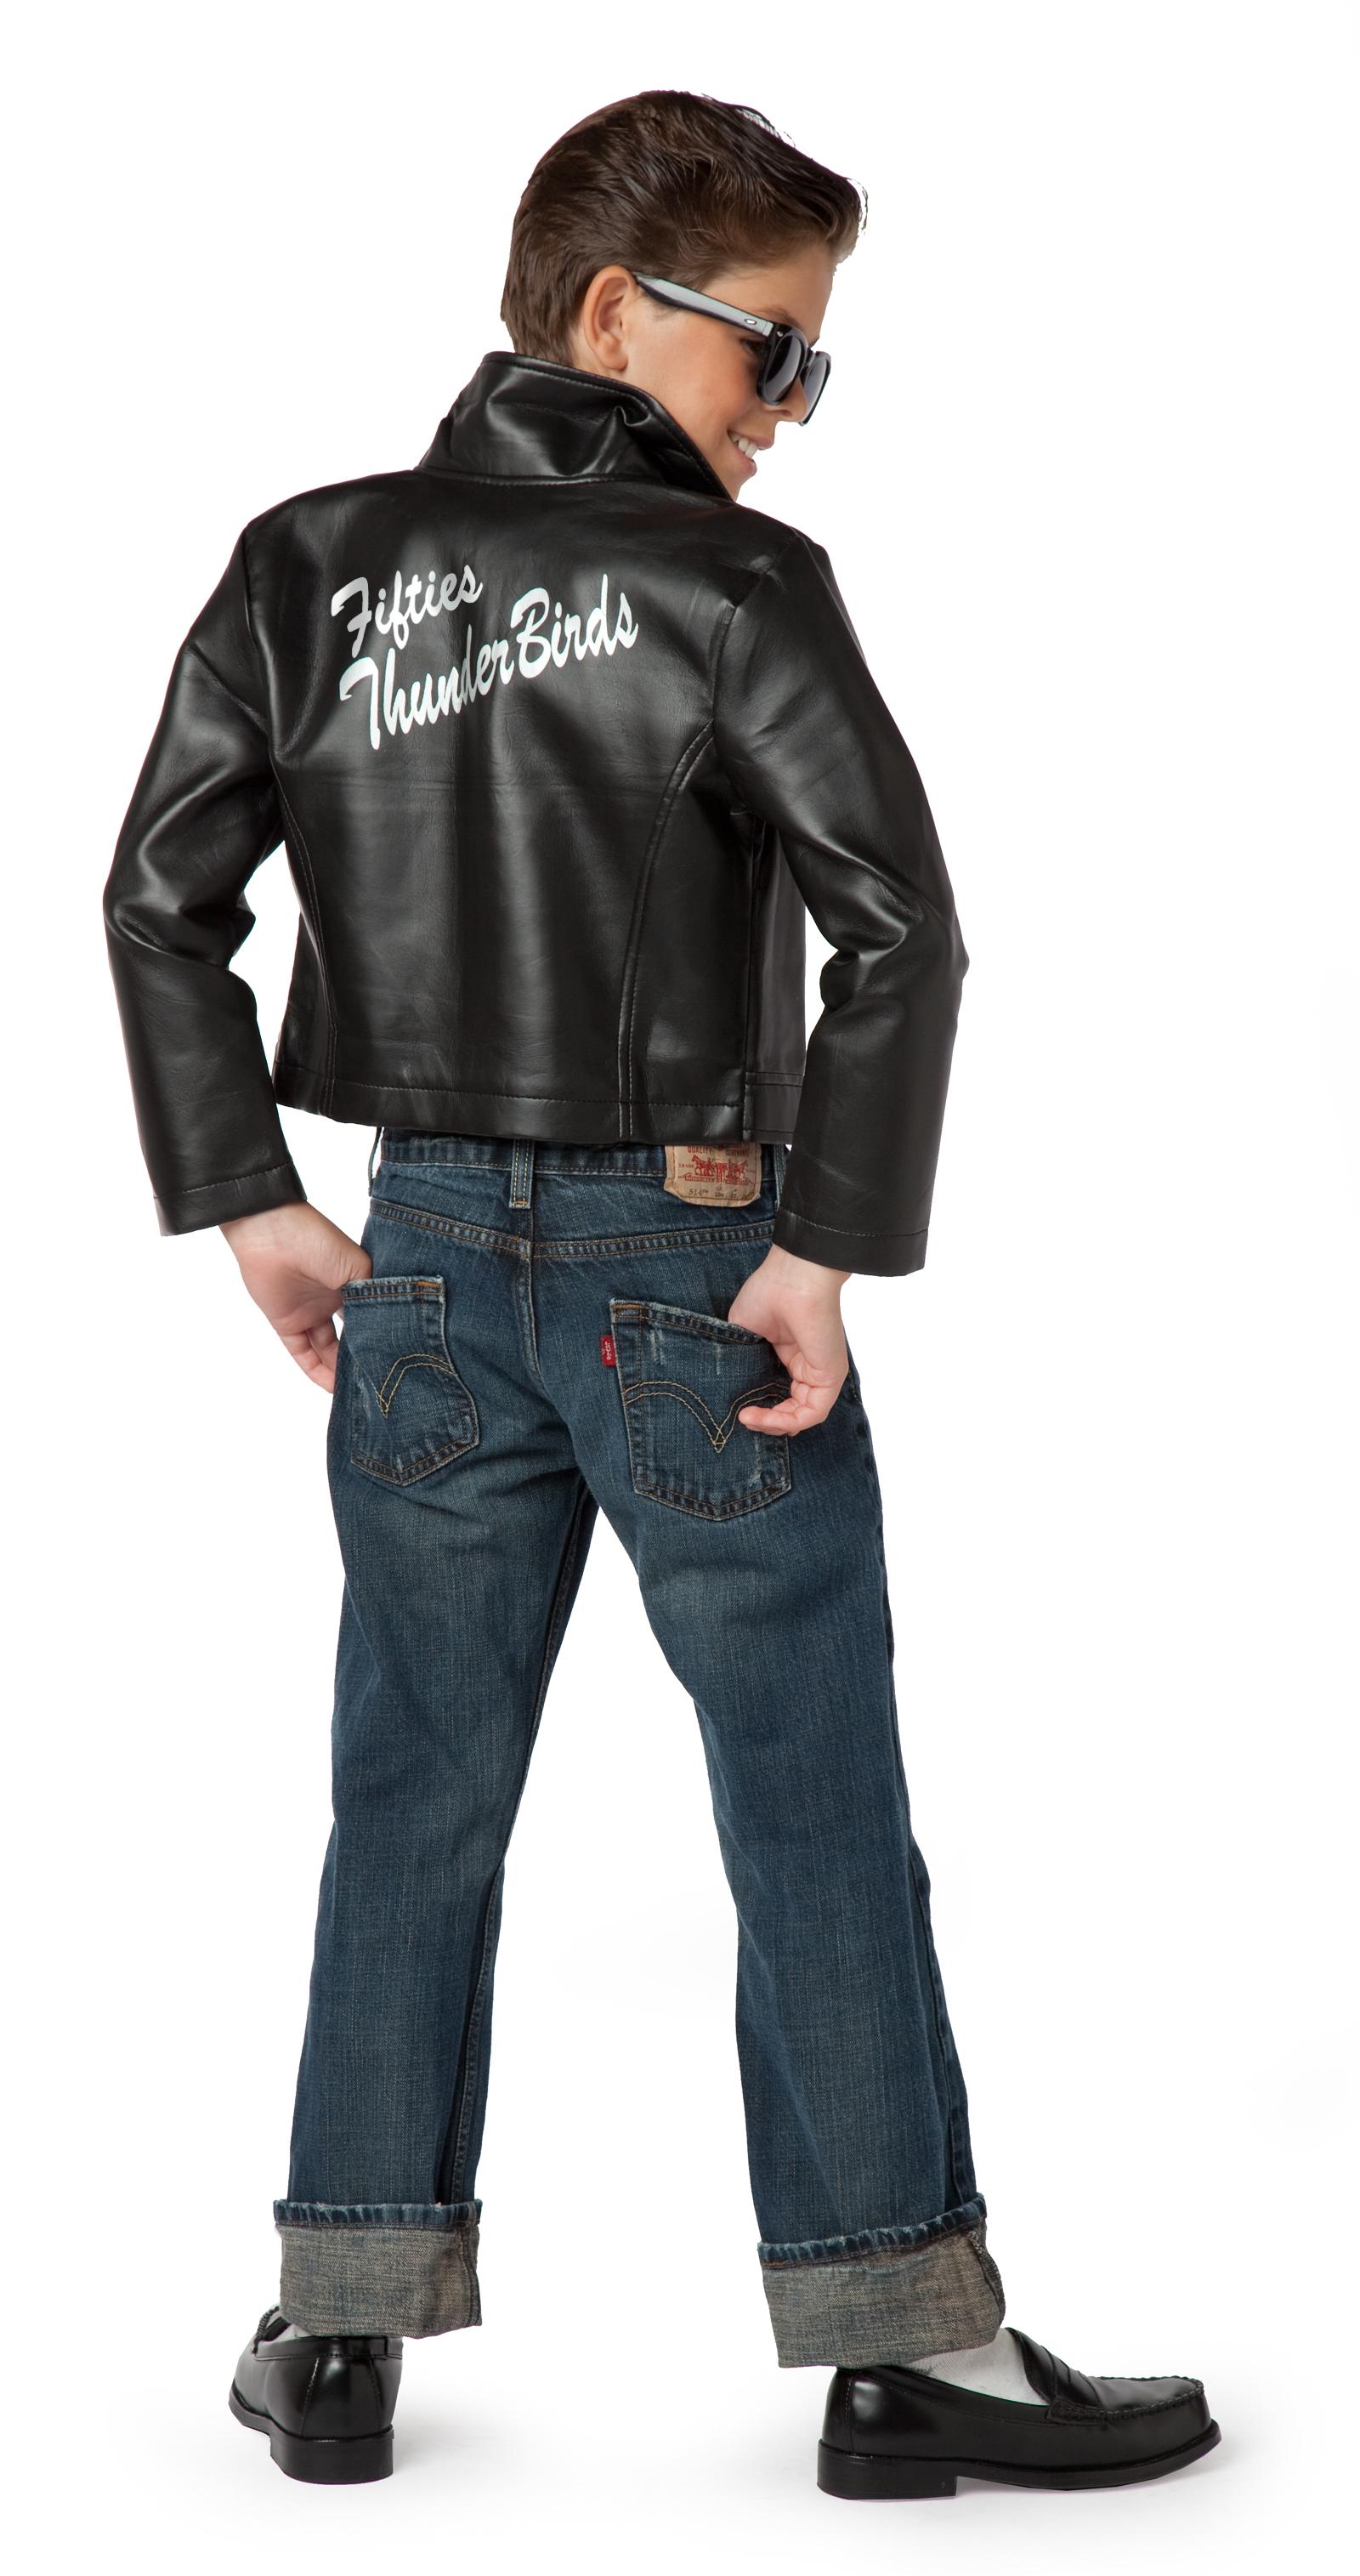 fifties thunderbird jacket child costume buycostumescom - Halloween Scary Costumes For Boys